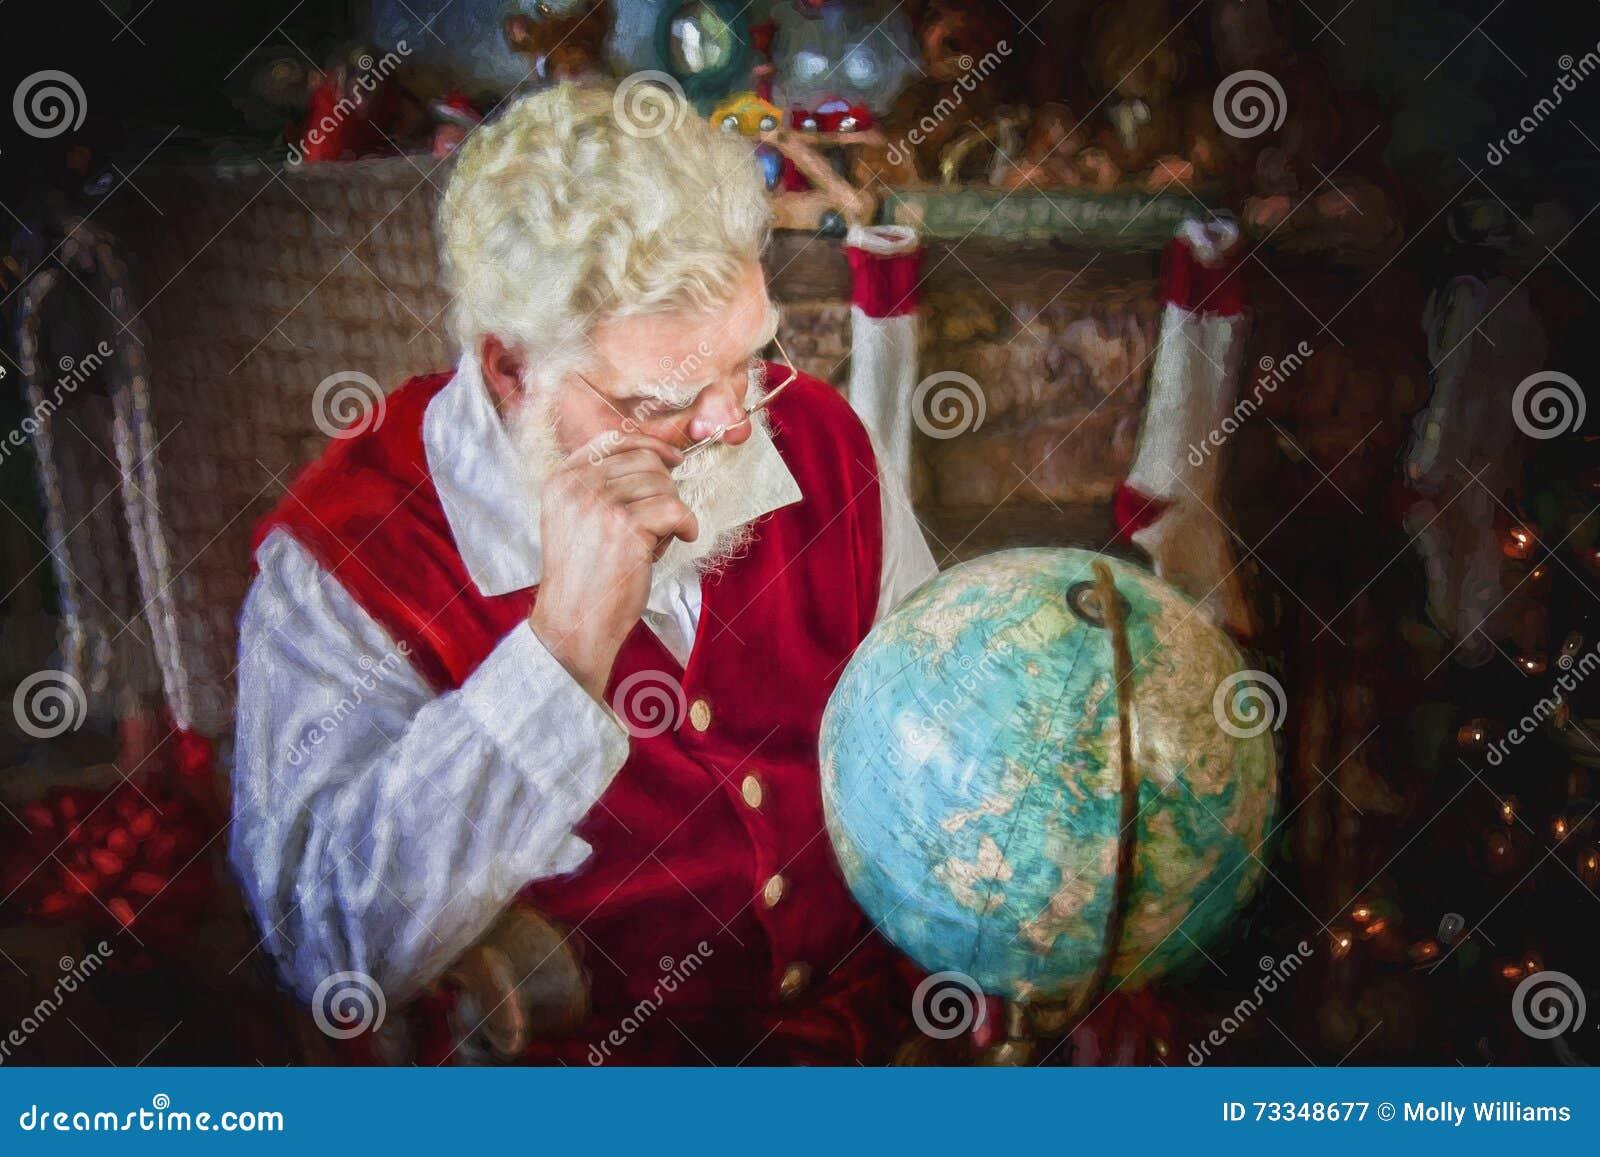 Santa Claus studying globe